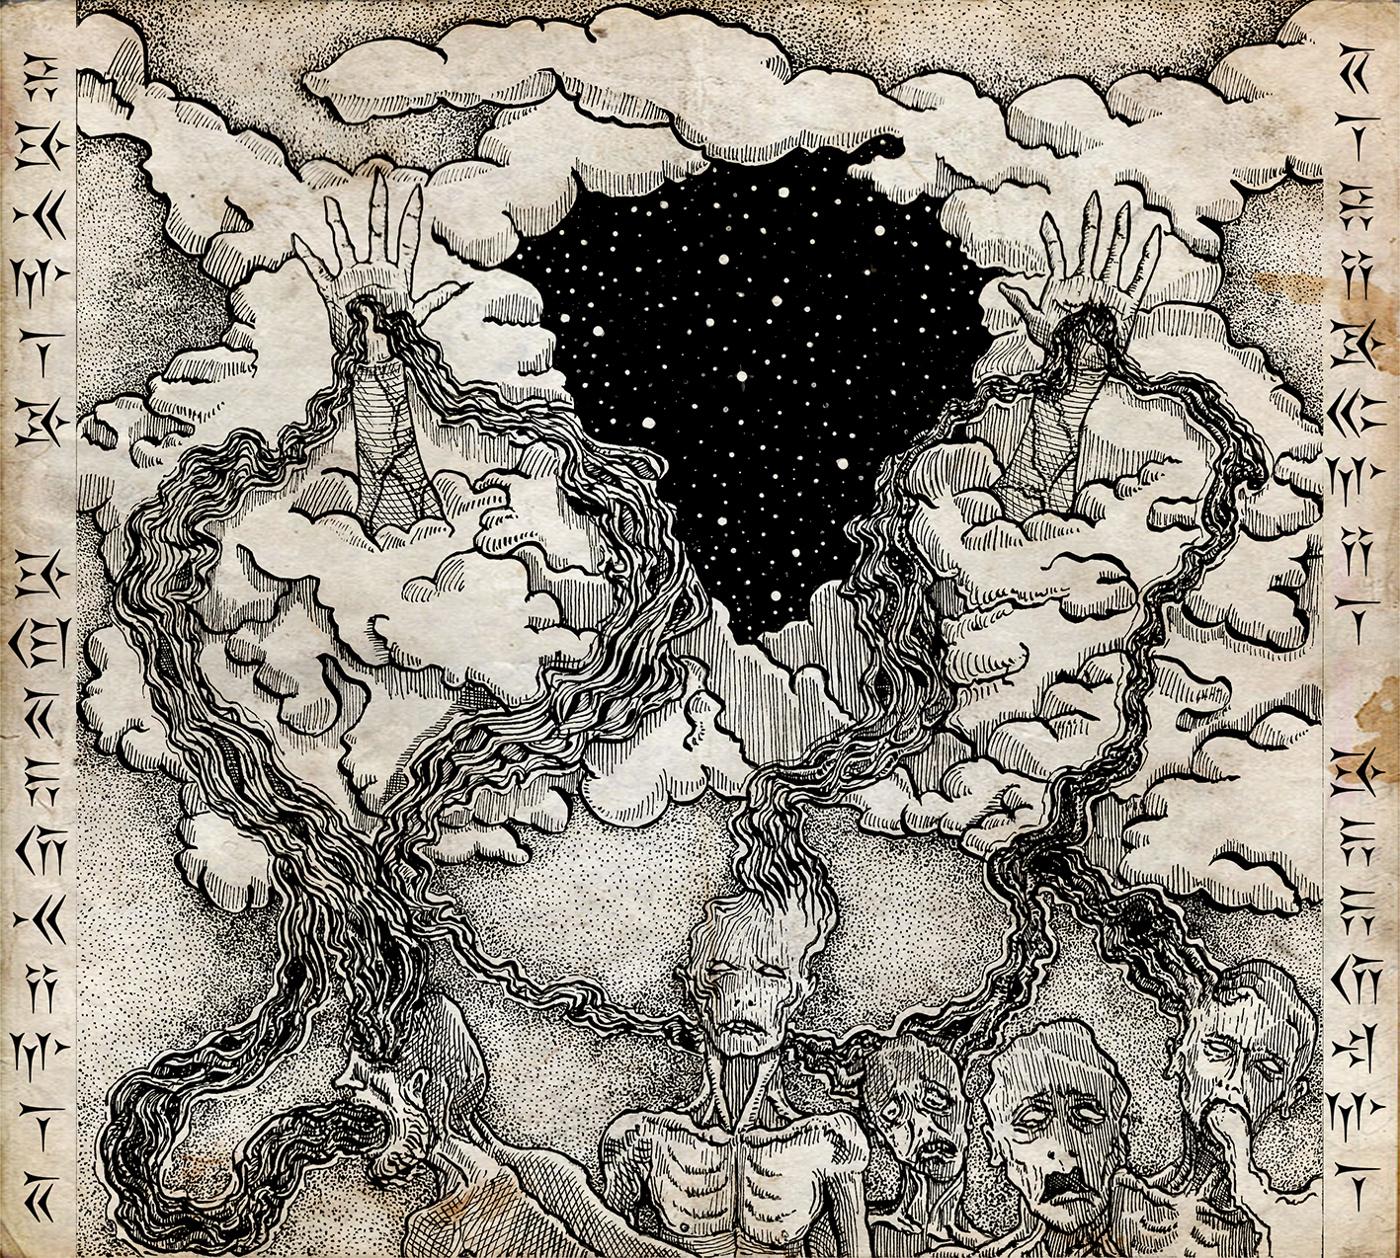 Sapientia-Occulta-coverart-v3